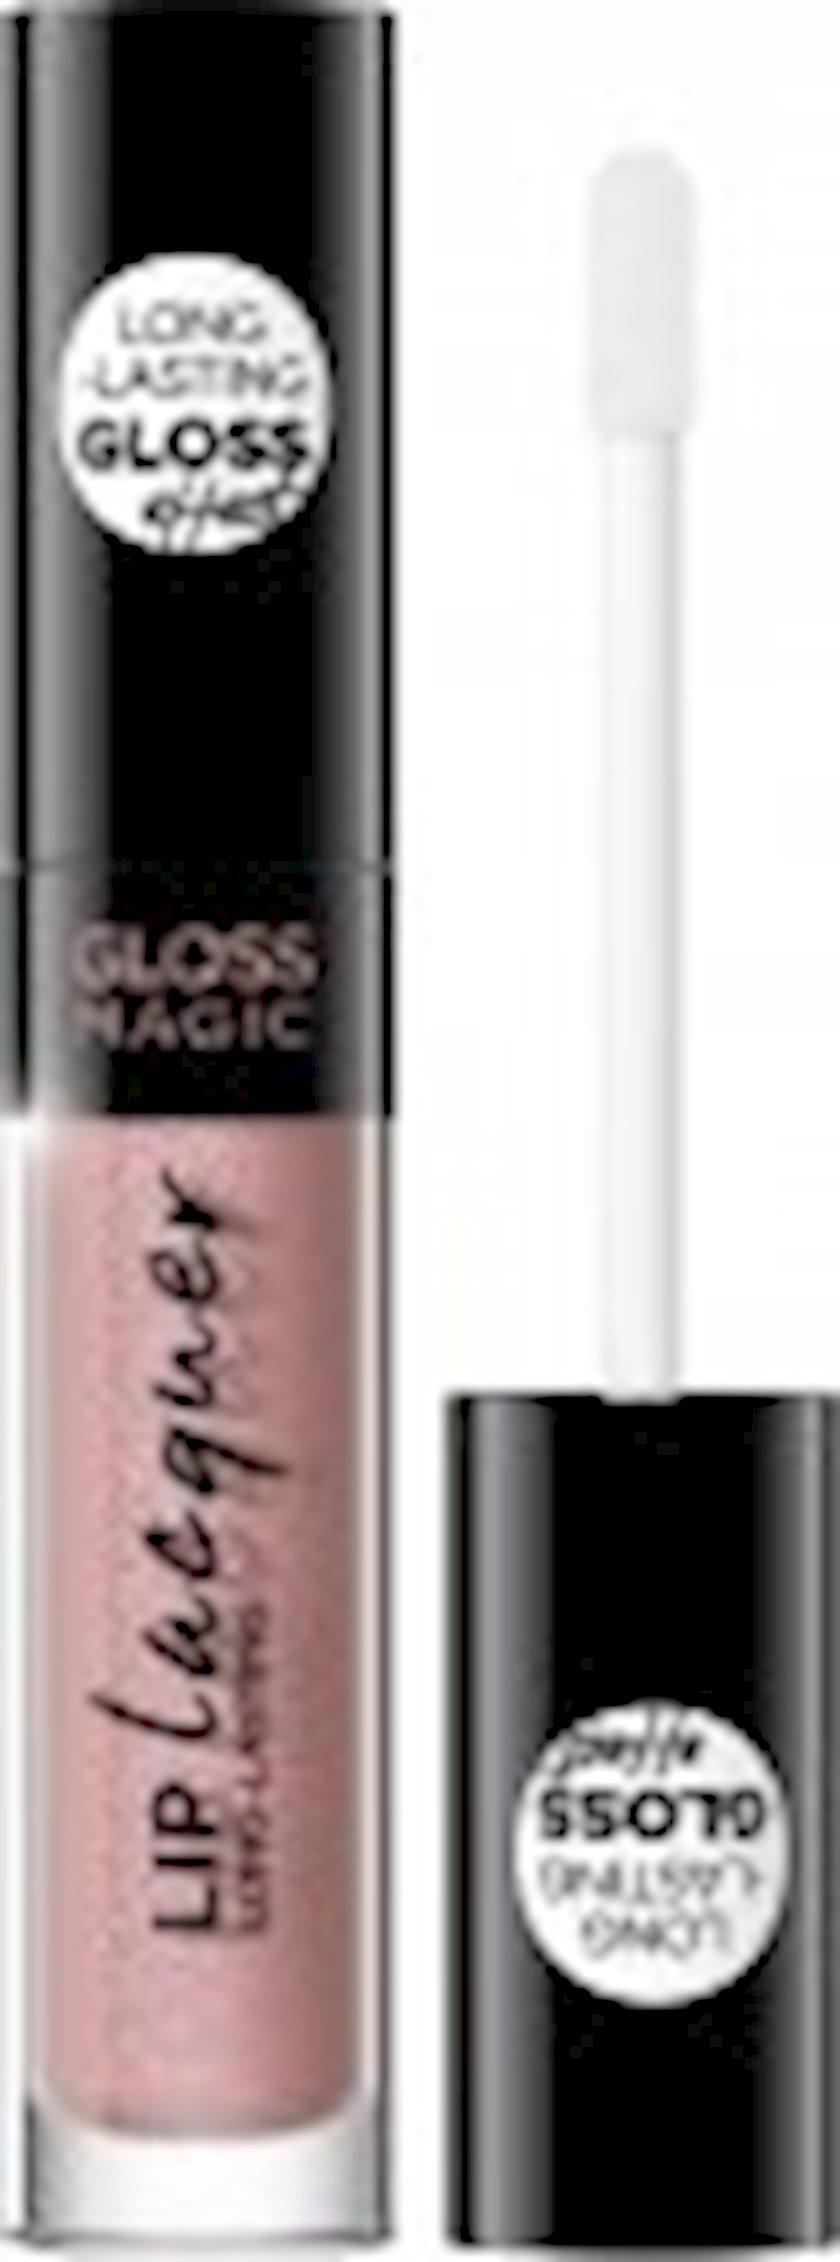 Dodaq üçün maye pomada  Eveline Gloss Magic Lip Lacquer 25 Coral Reef